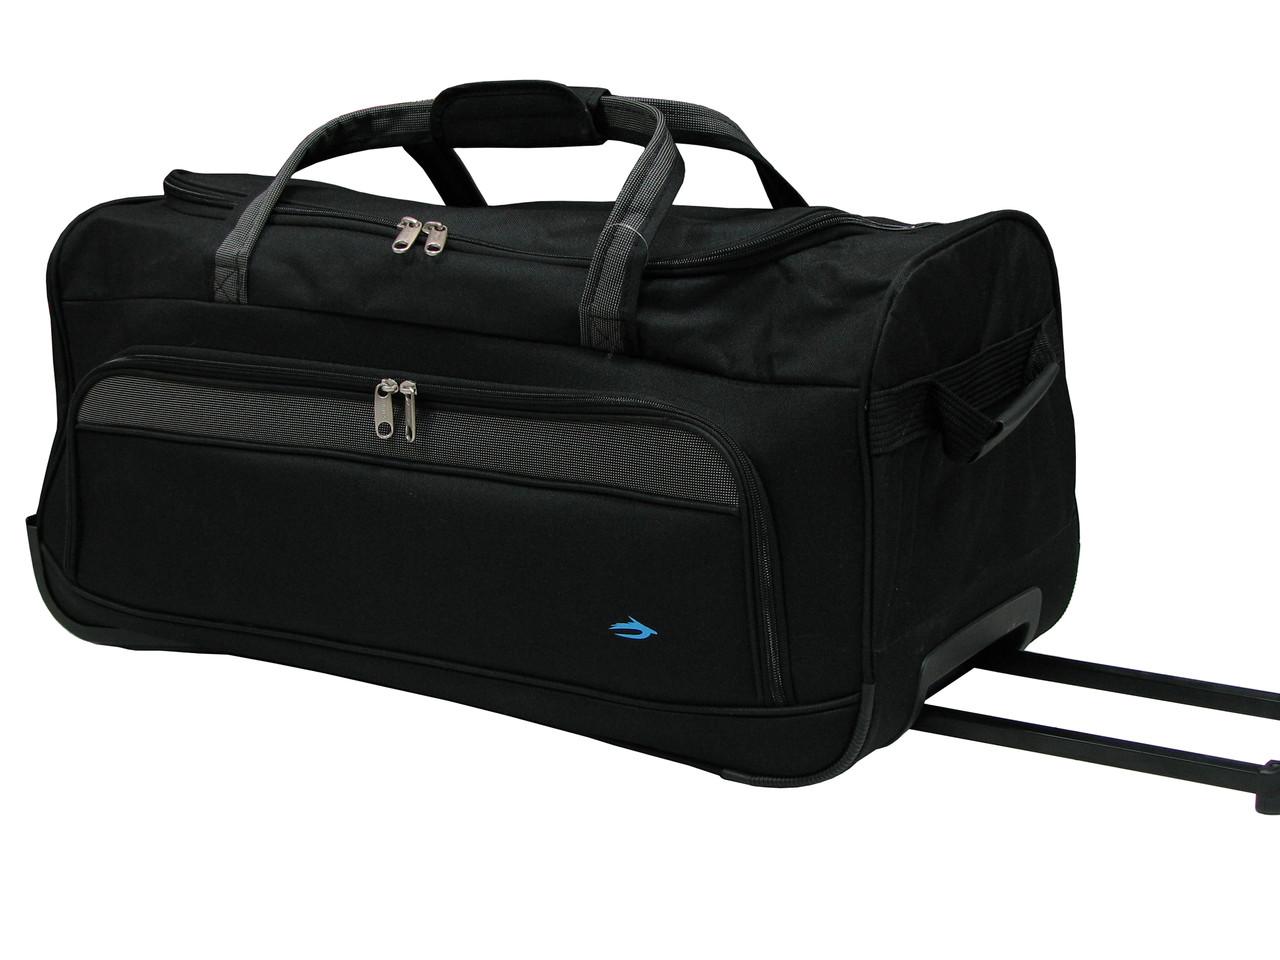 cee53b8f3a29 Дорожная сумка среднего размера на 2 колесах Airtex 4545: продажа ...